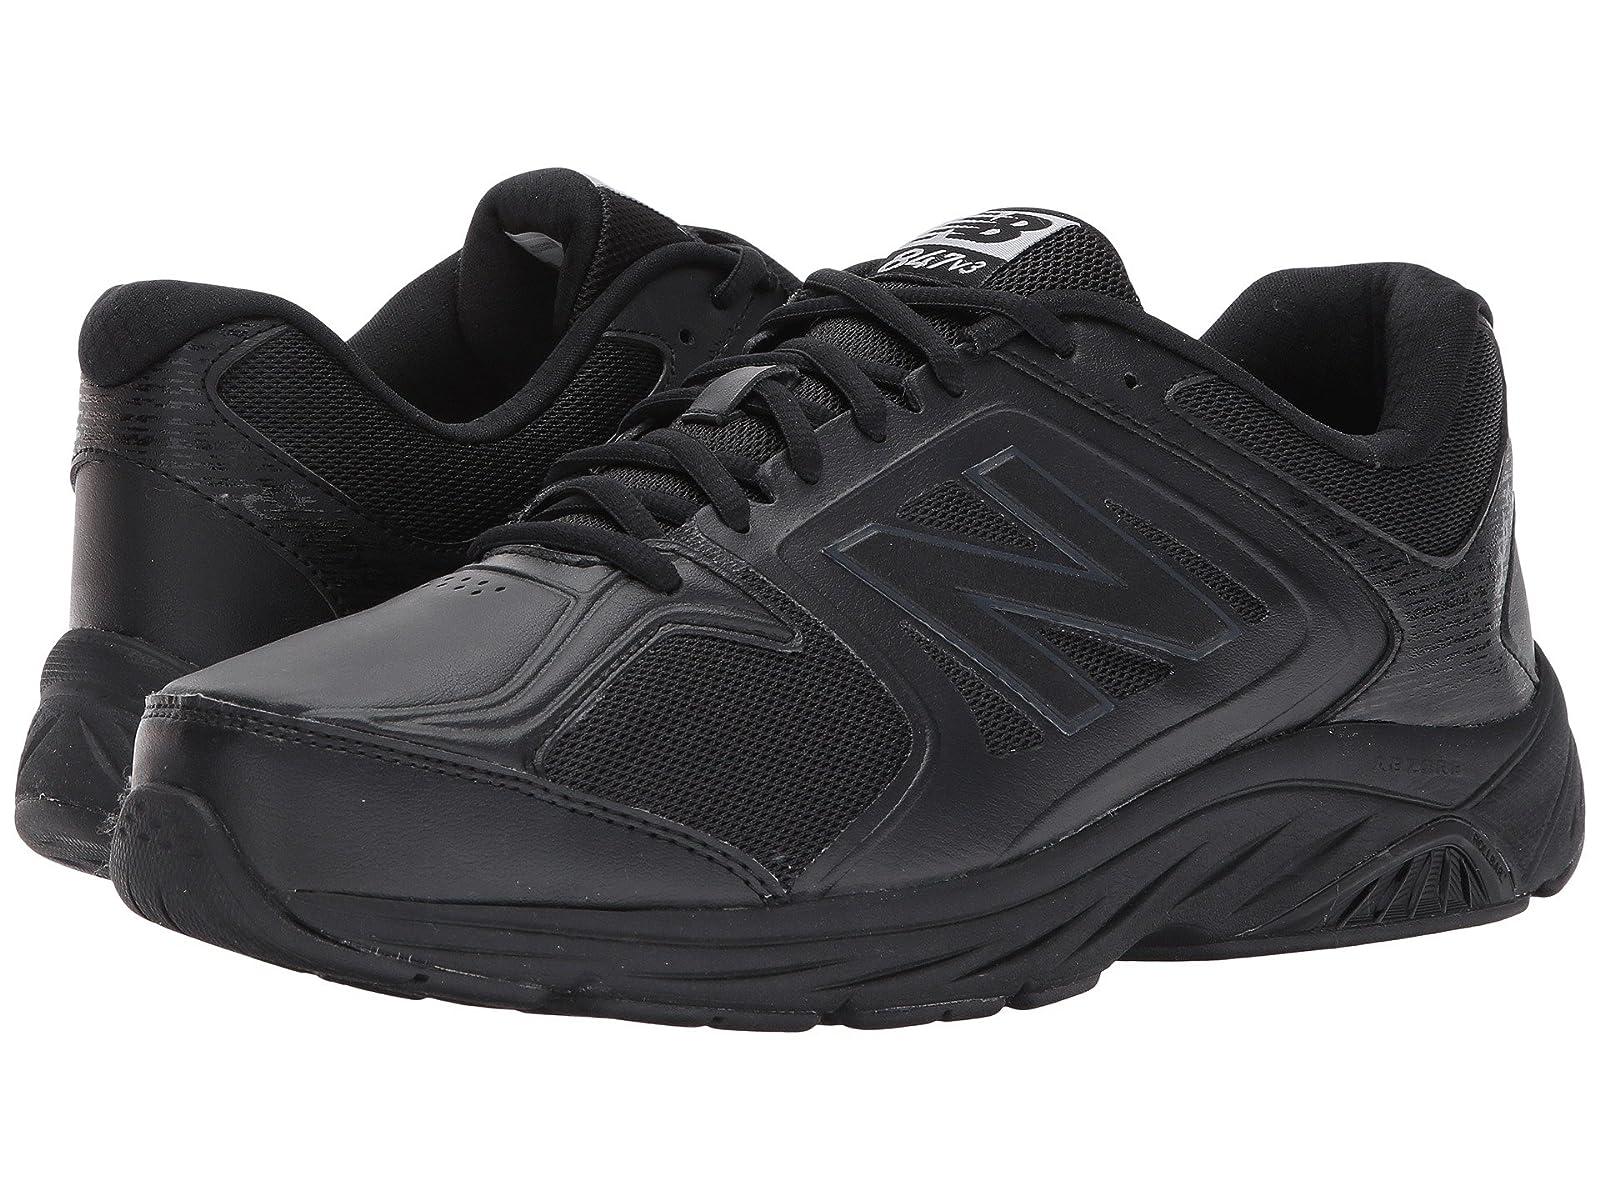 New Balance MW847v3Atmospheric grades have affordable shoes